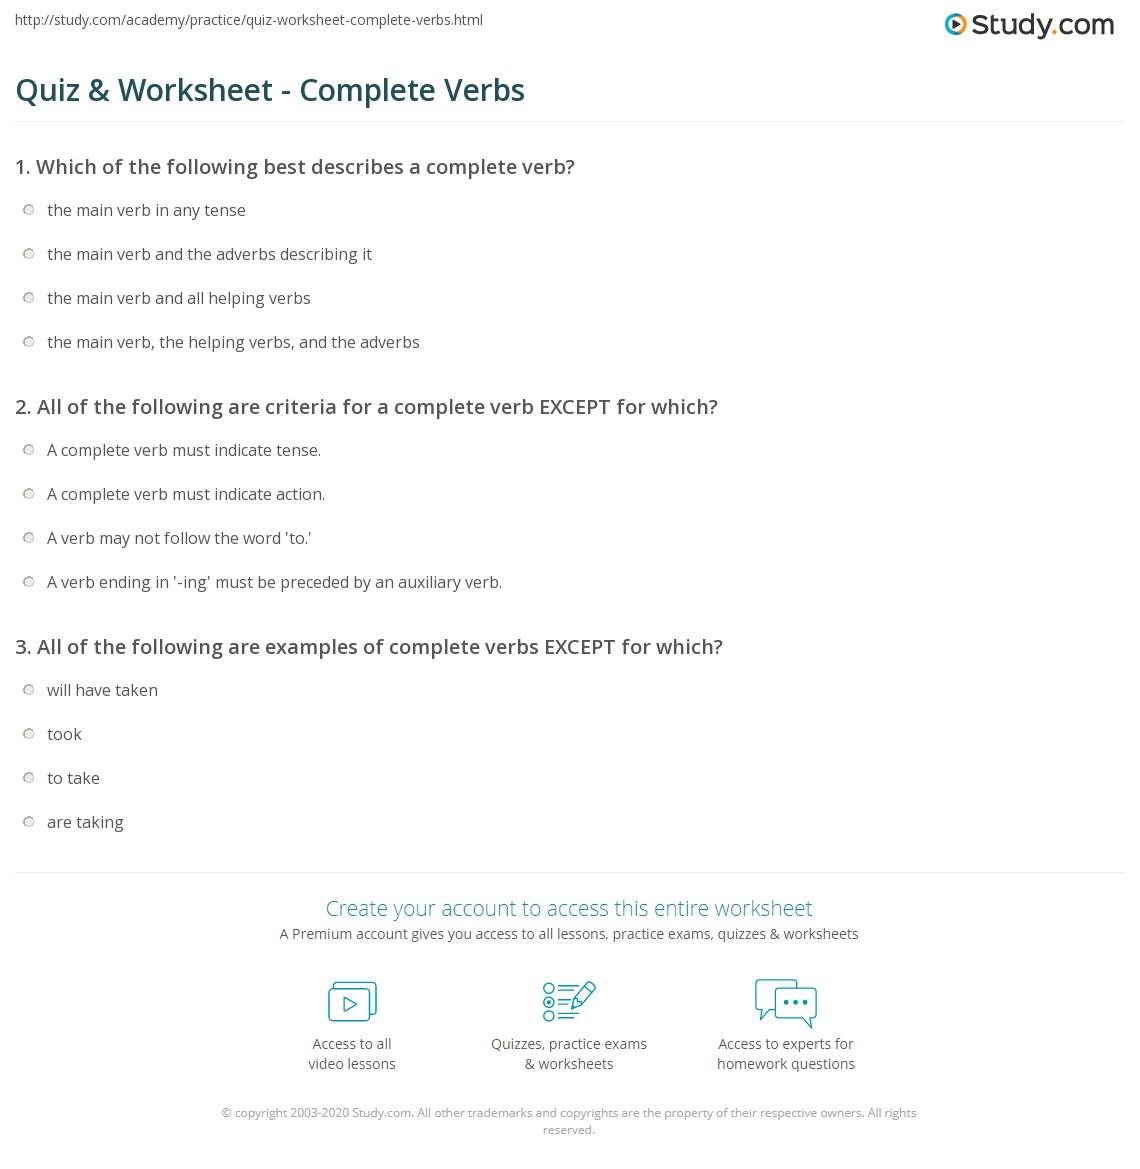 Quiz Worksheet Complete Verbs Study